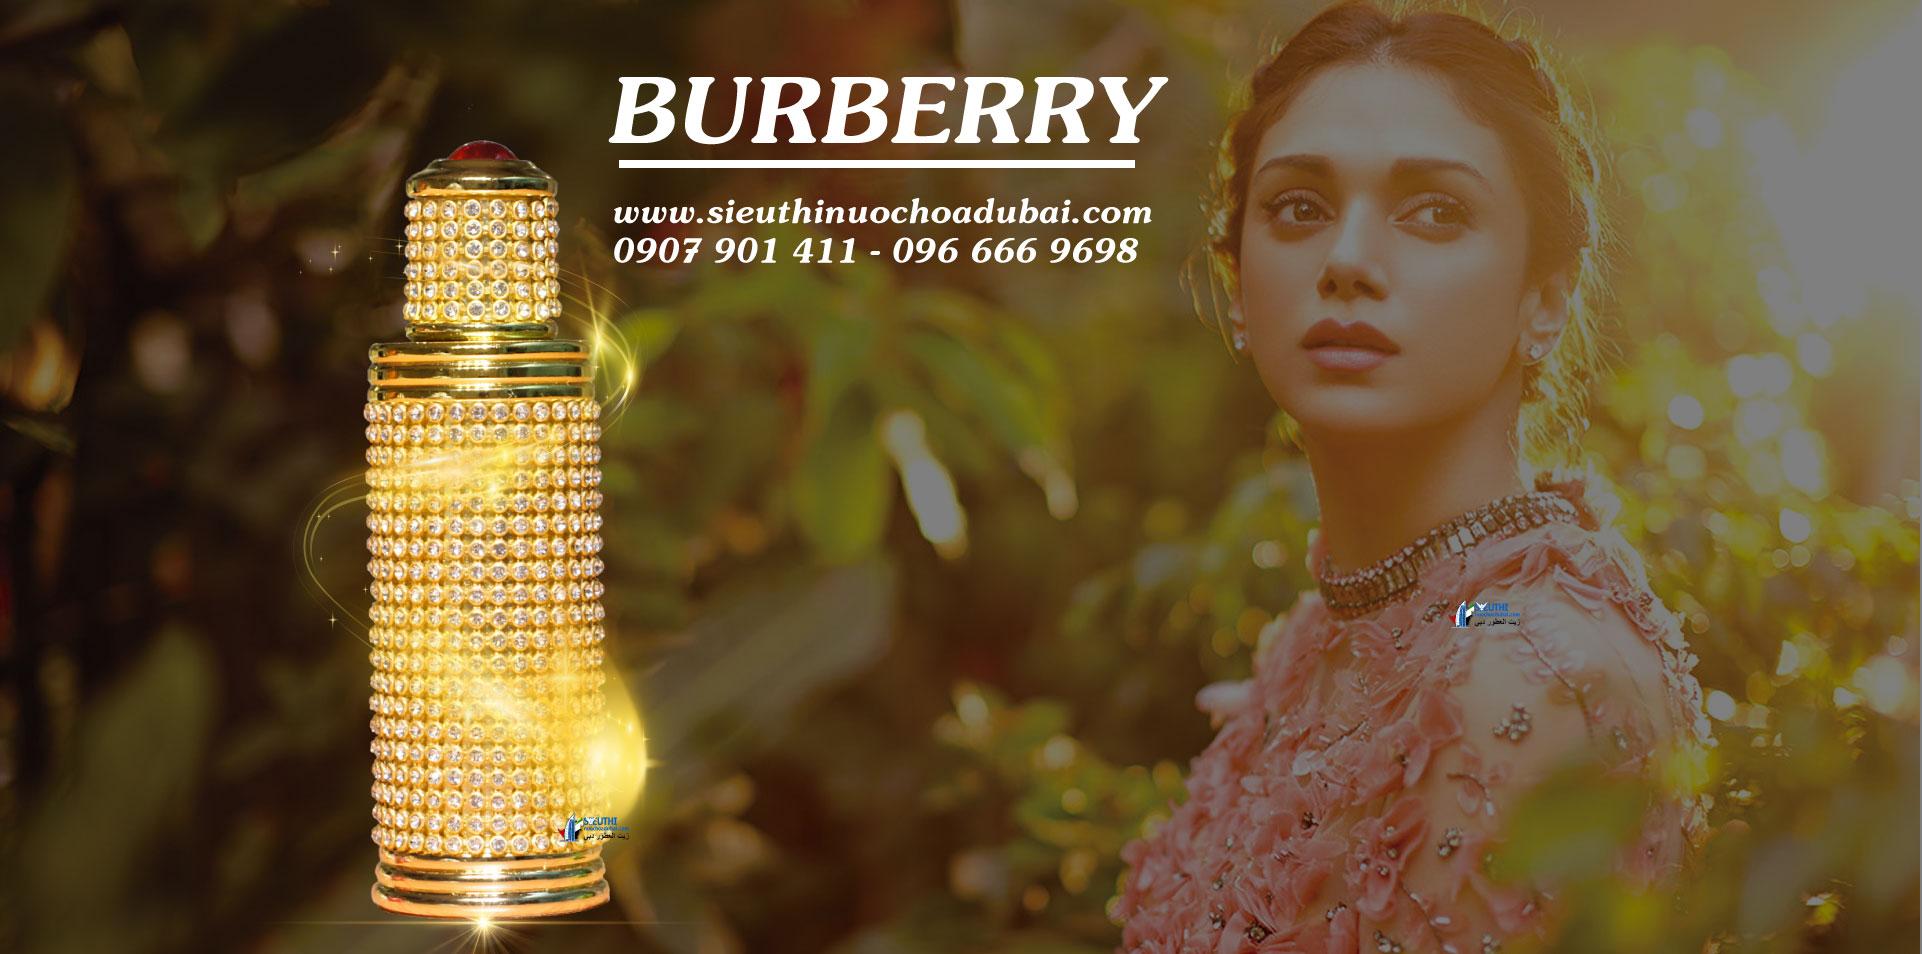 burberry-2